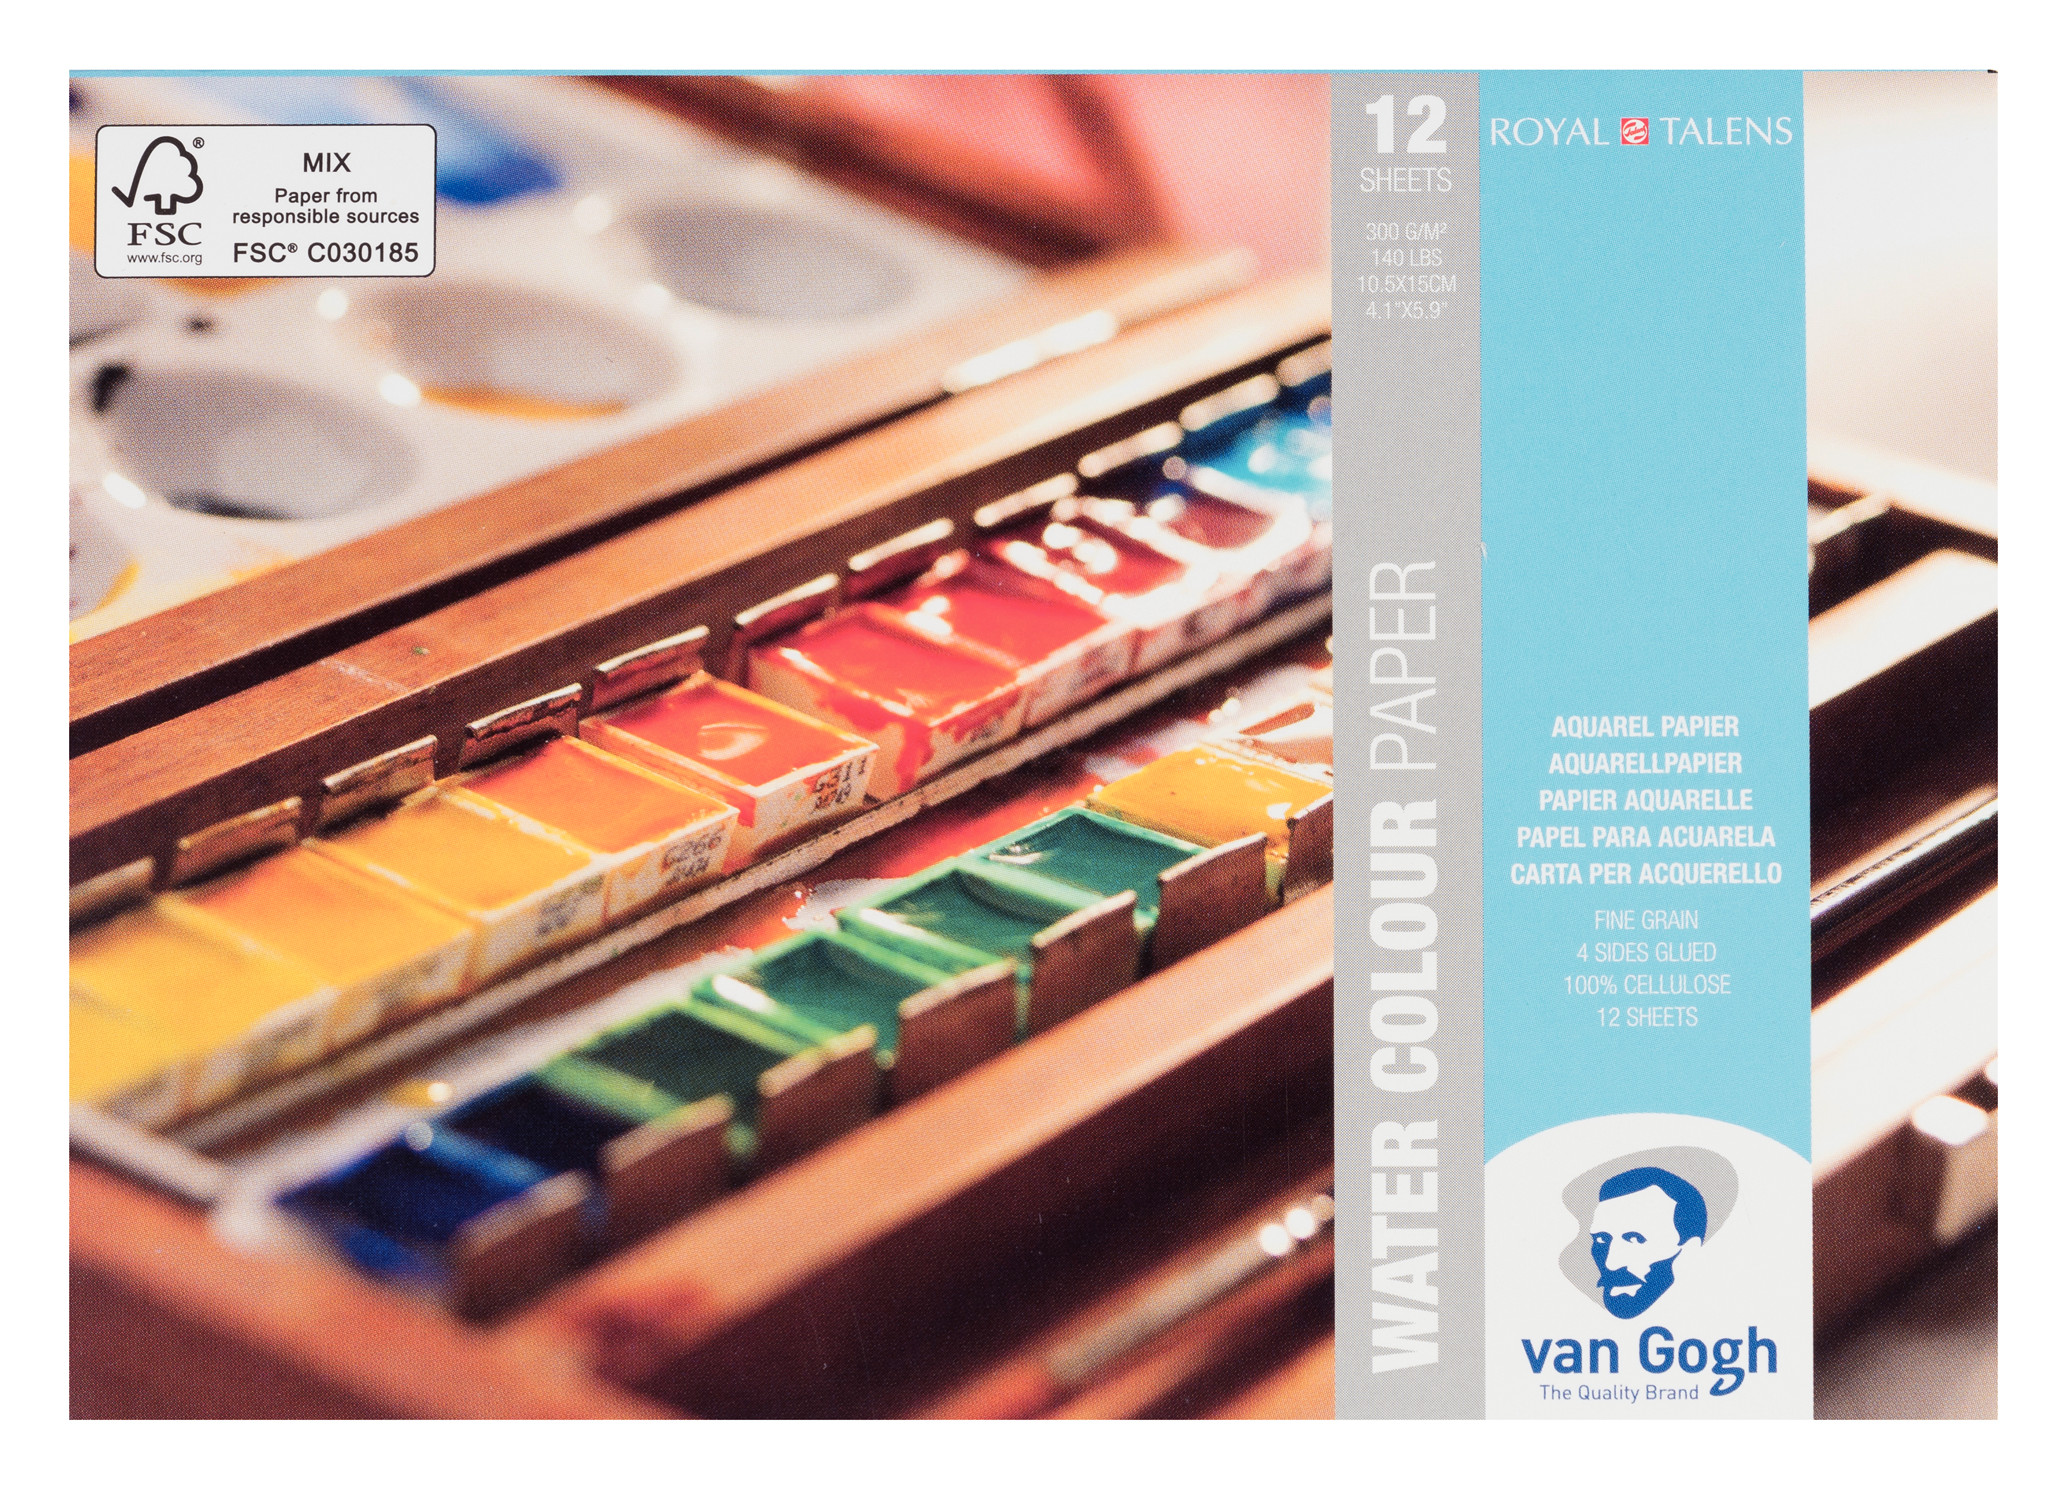 Van Gogh Water Colour Paper Block, 12 Sheets, 300g/140lb., size 10.5 x 15cm / 4.1 x 5.9